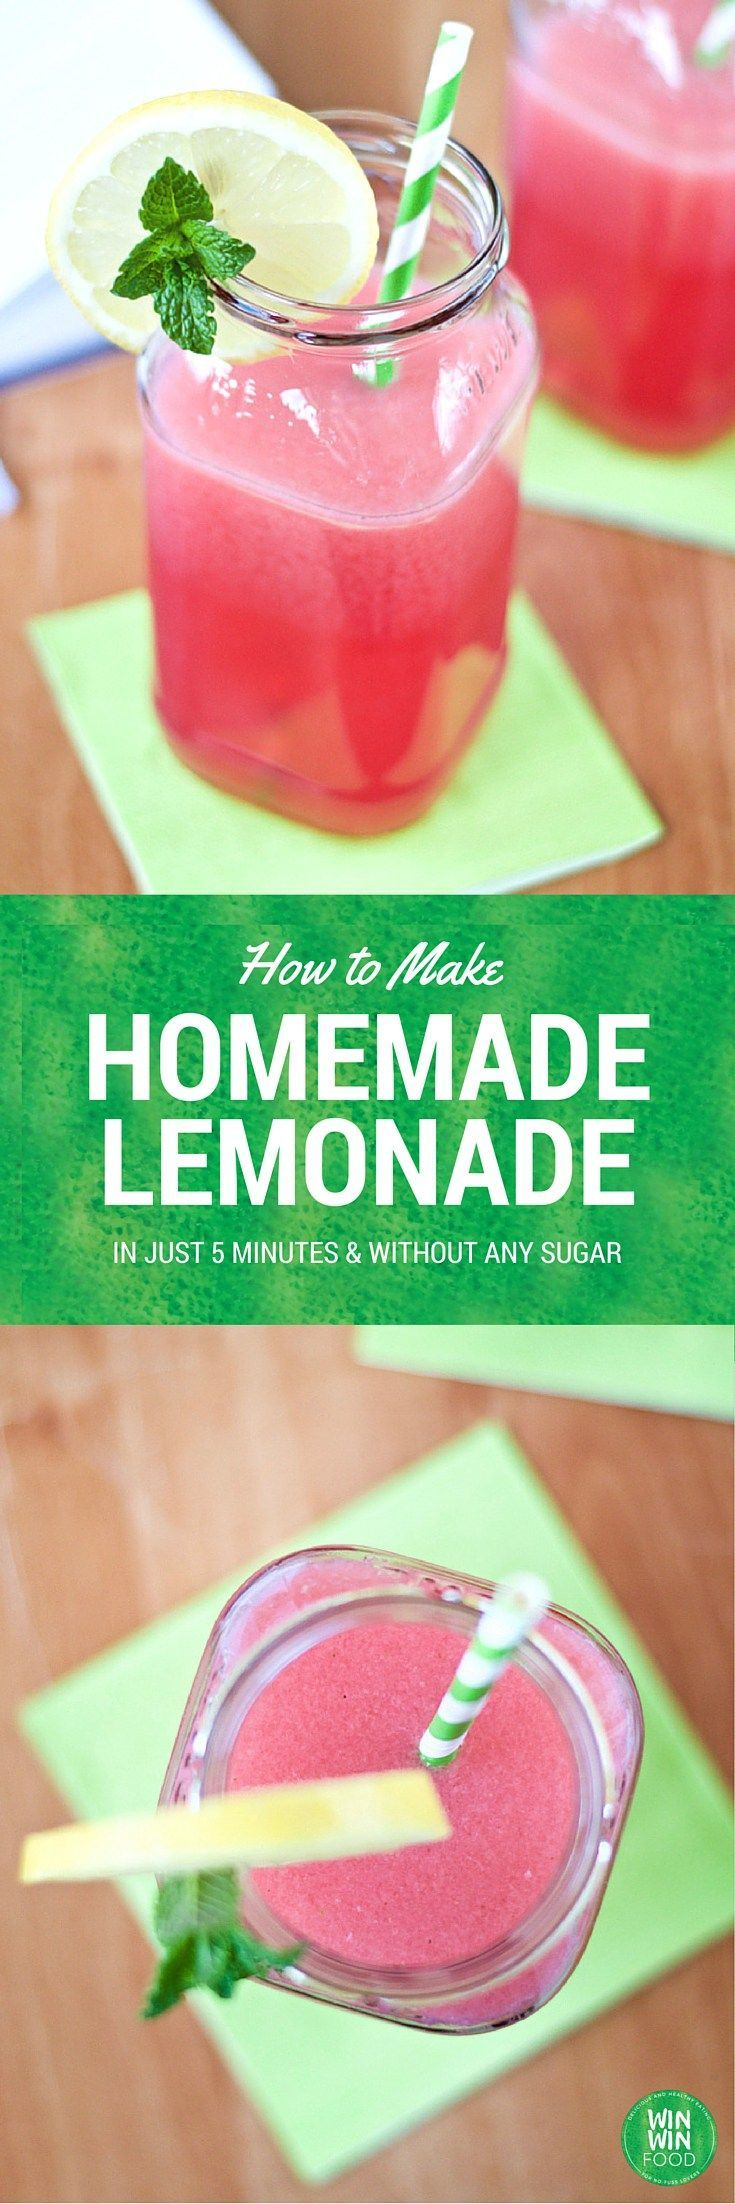 How to Make Homemade Lemonade| WIN-WINFOOD.com #healthy #vegan #glutenfree…